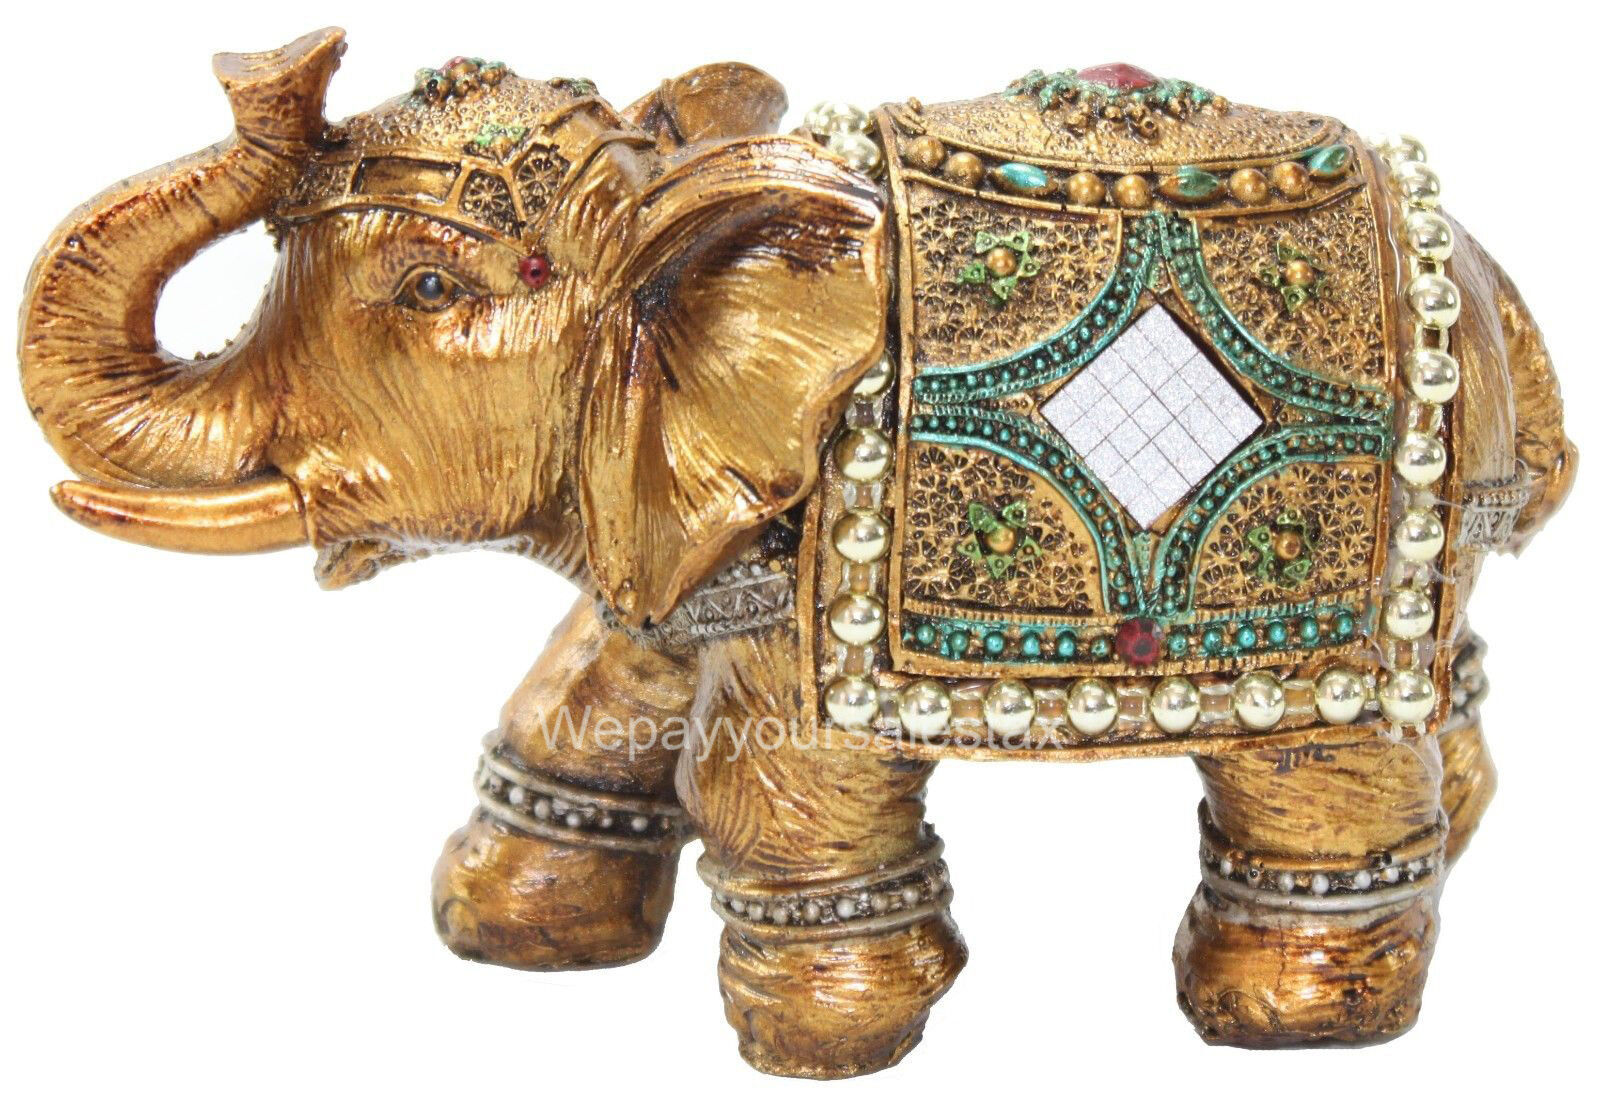 feng shui brass color 6 elegant elephant statue gold mini buddha figurine ebay. Black Bedroom Furniture Sets. Home Design Ideas